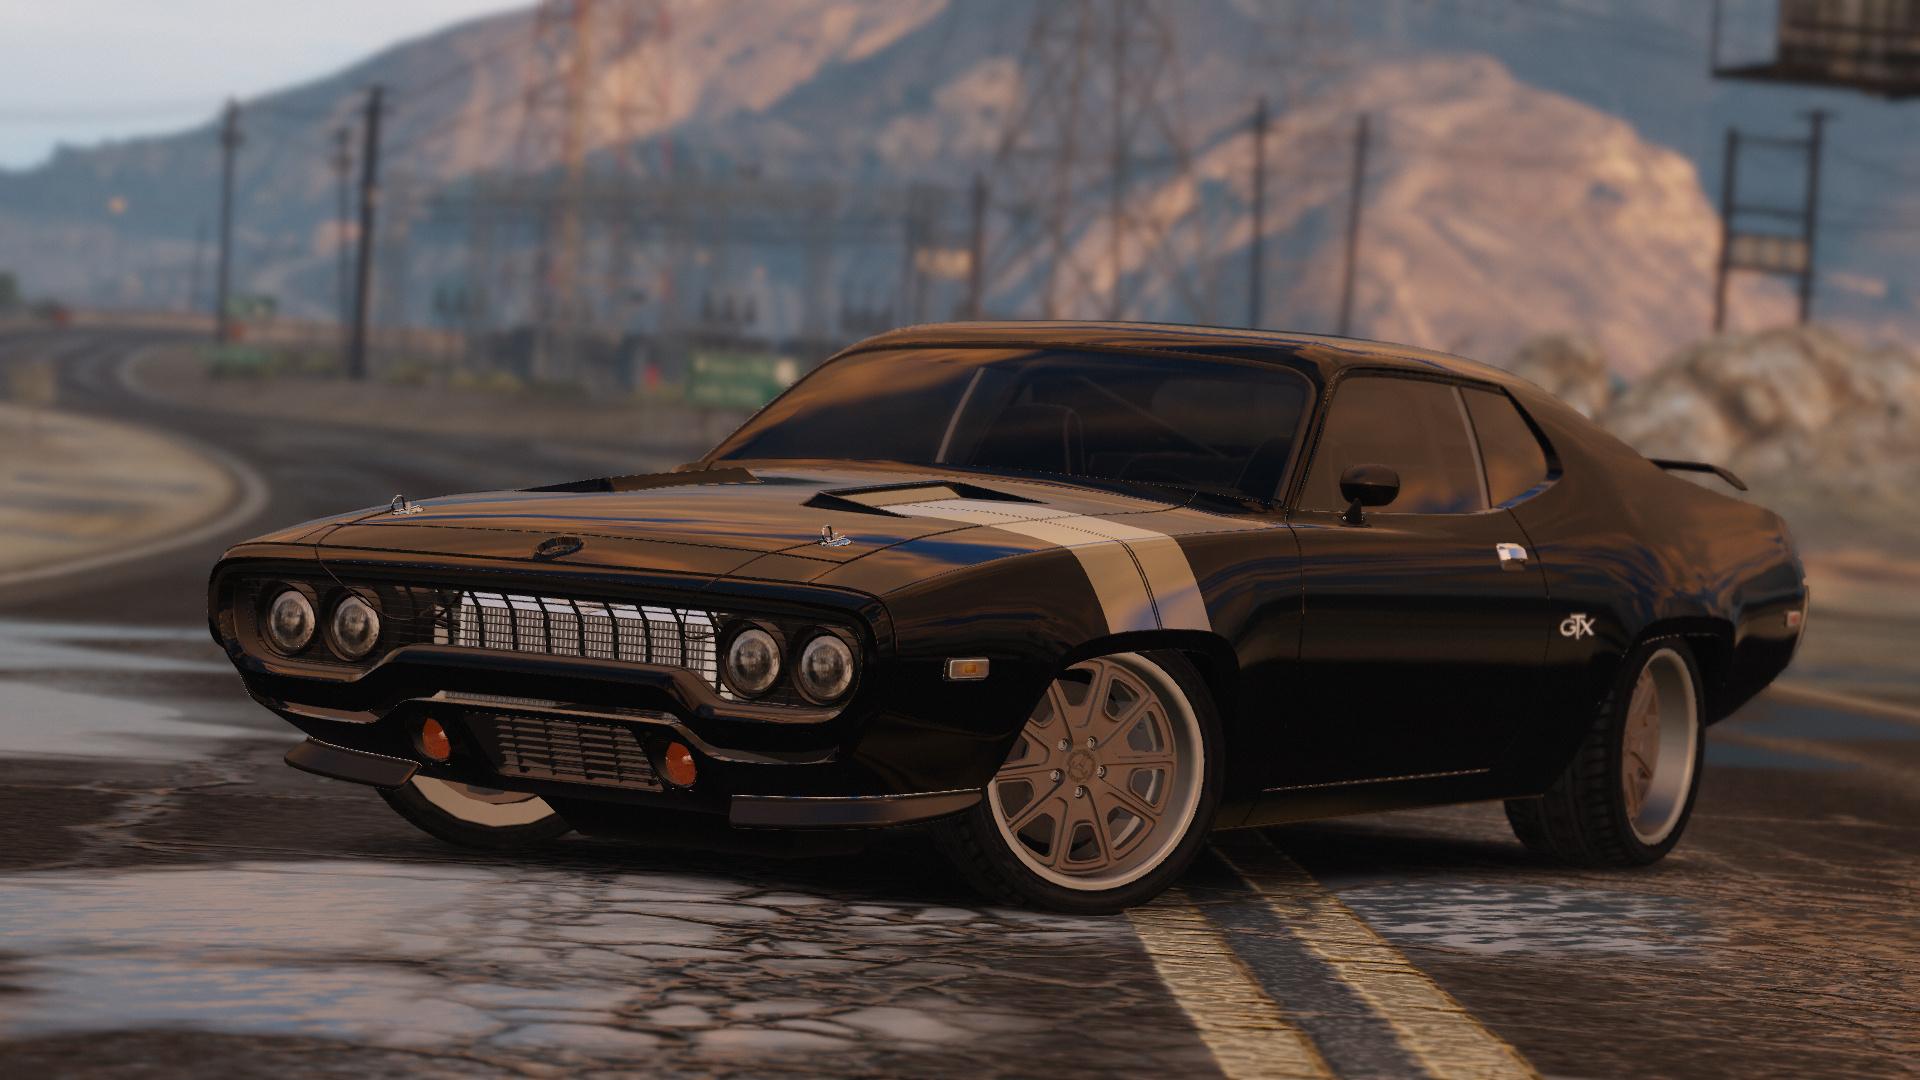 Plymouth roadrunner gtx